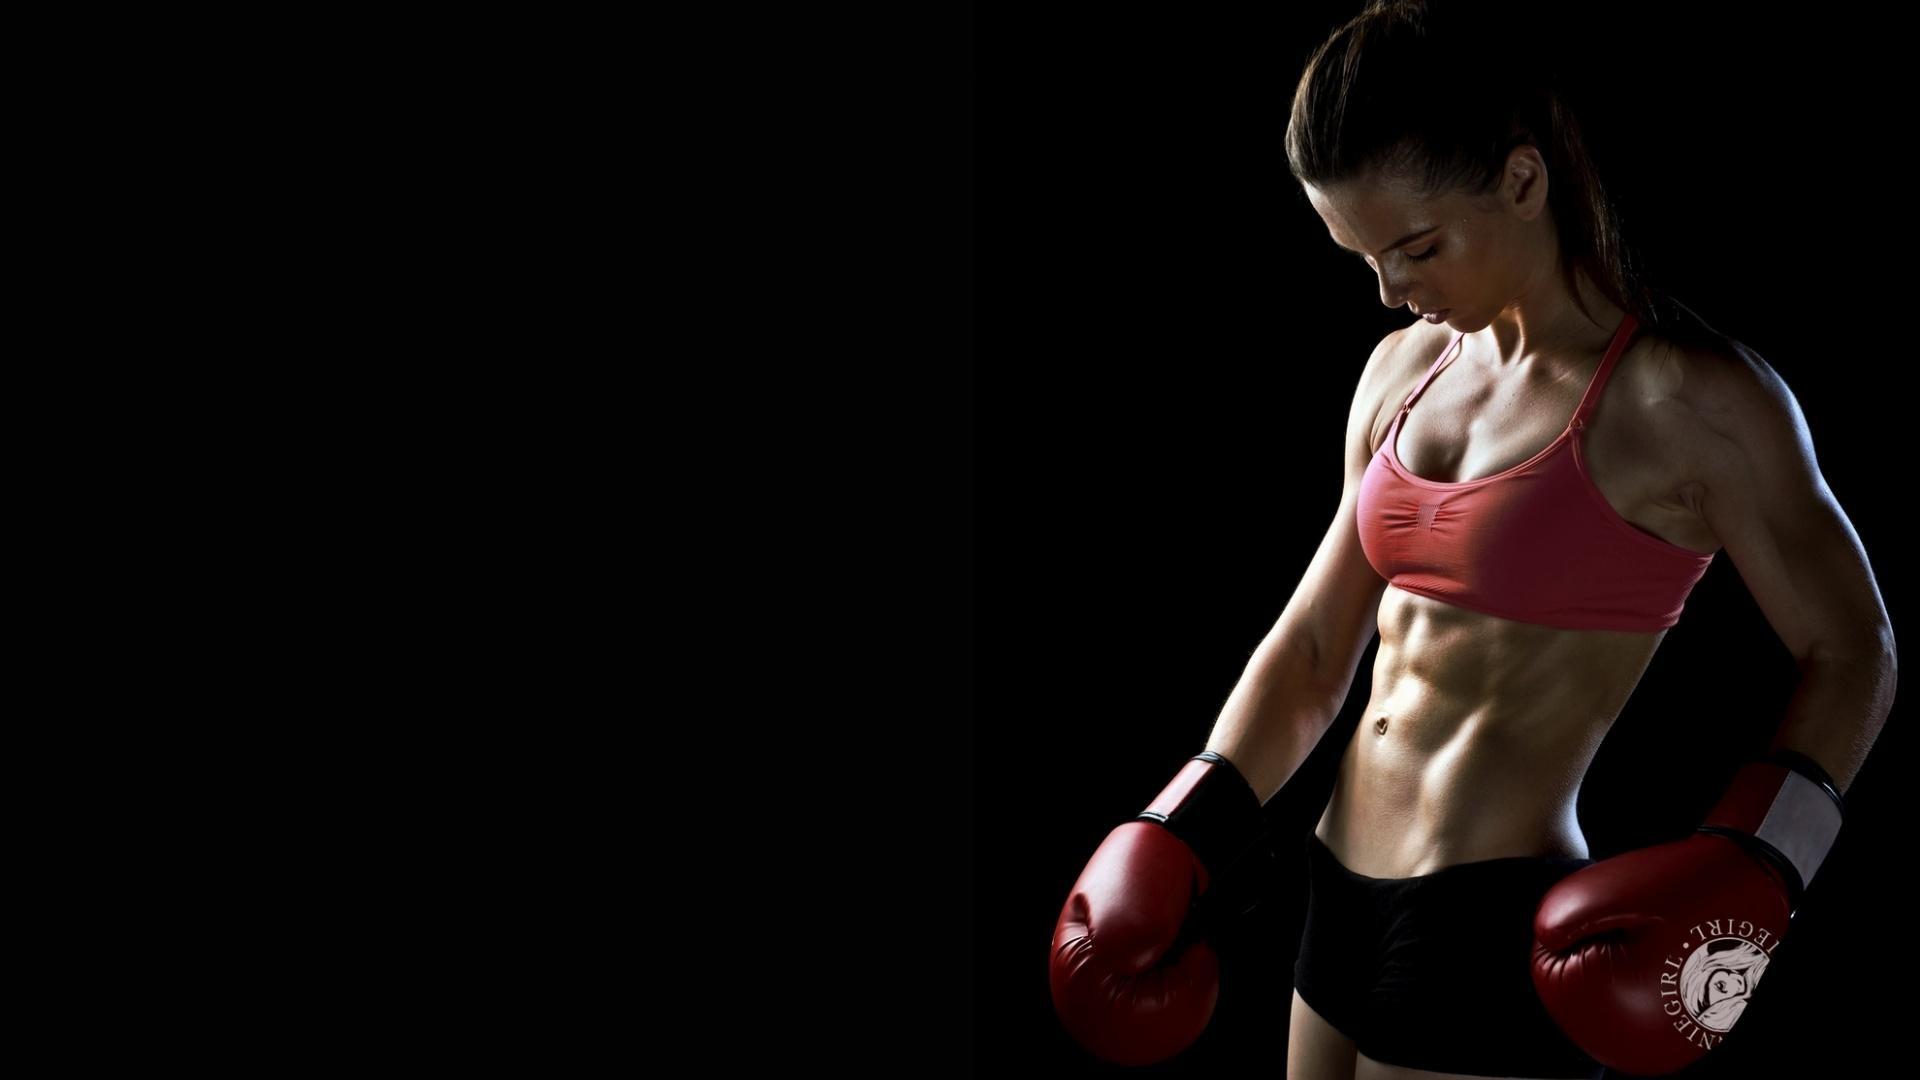 wallpaper.wiki-Download-Boxing-Gloves-Image-PIC-WPB008614